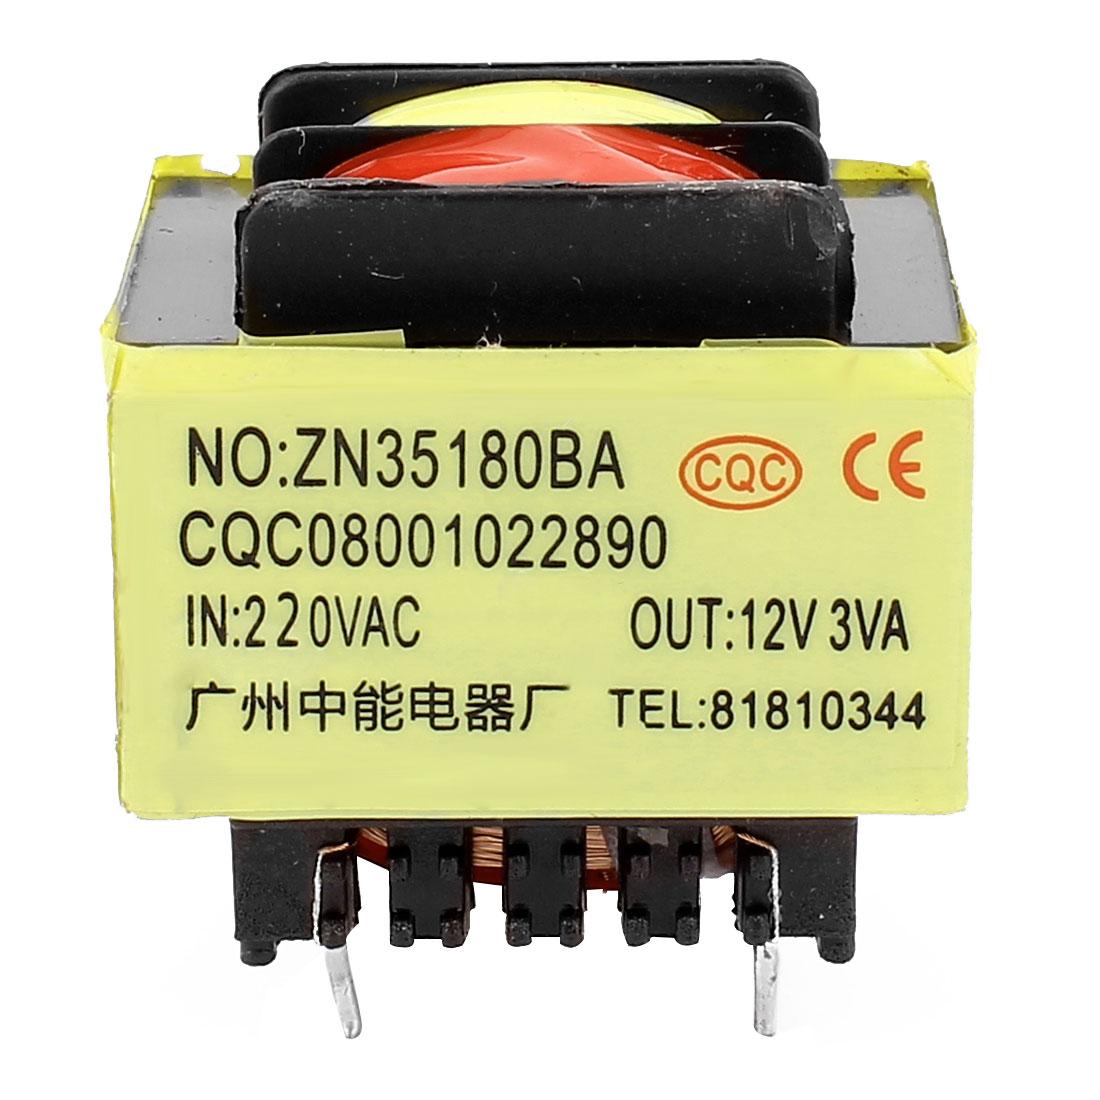 220V Input 12V 3VA Output Yellow Red 5 Terminals Power Transformer 36x31x31mm